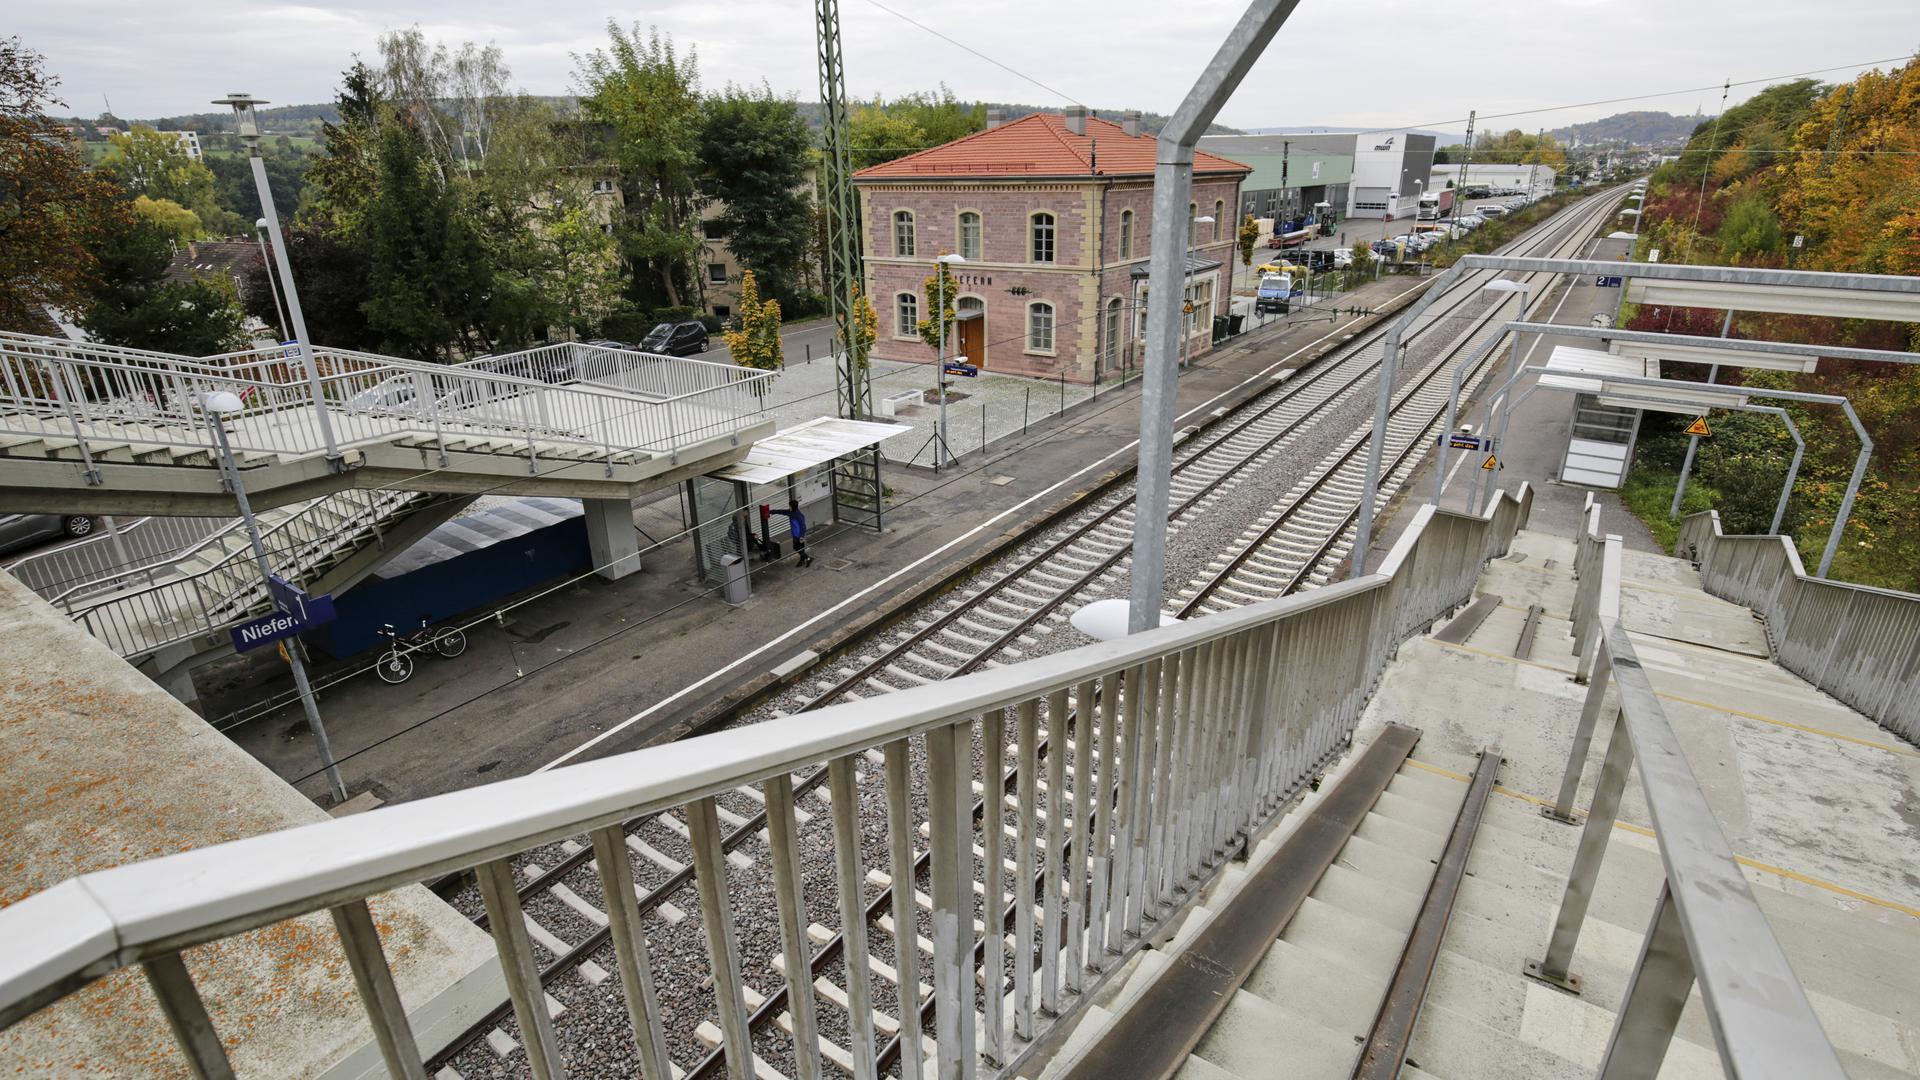 Bahnhof Bühl